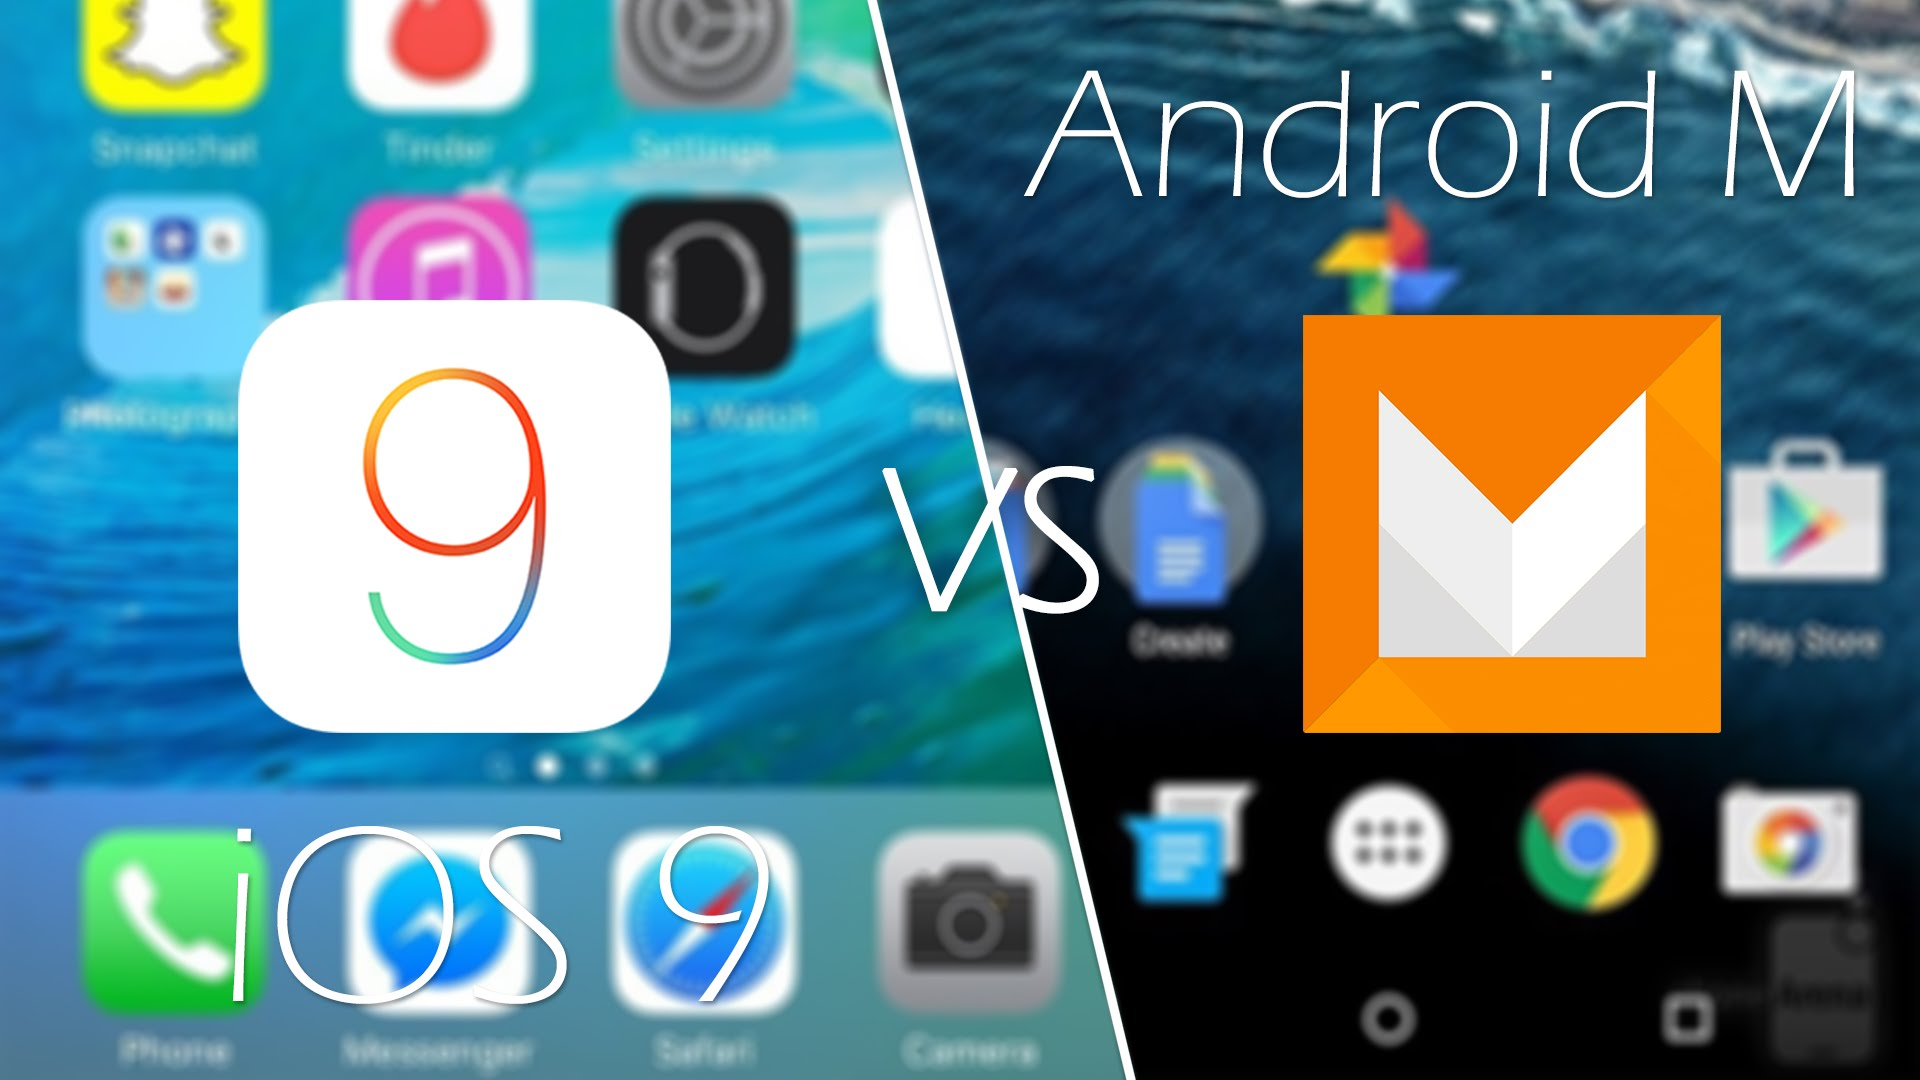 Android-6.0-Marshmallow-iOS-9.jpg